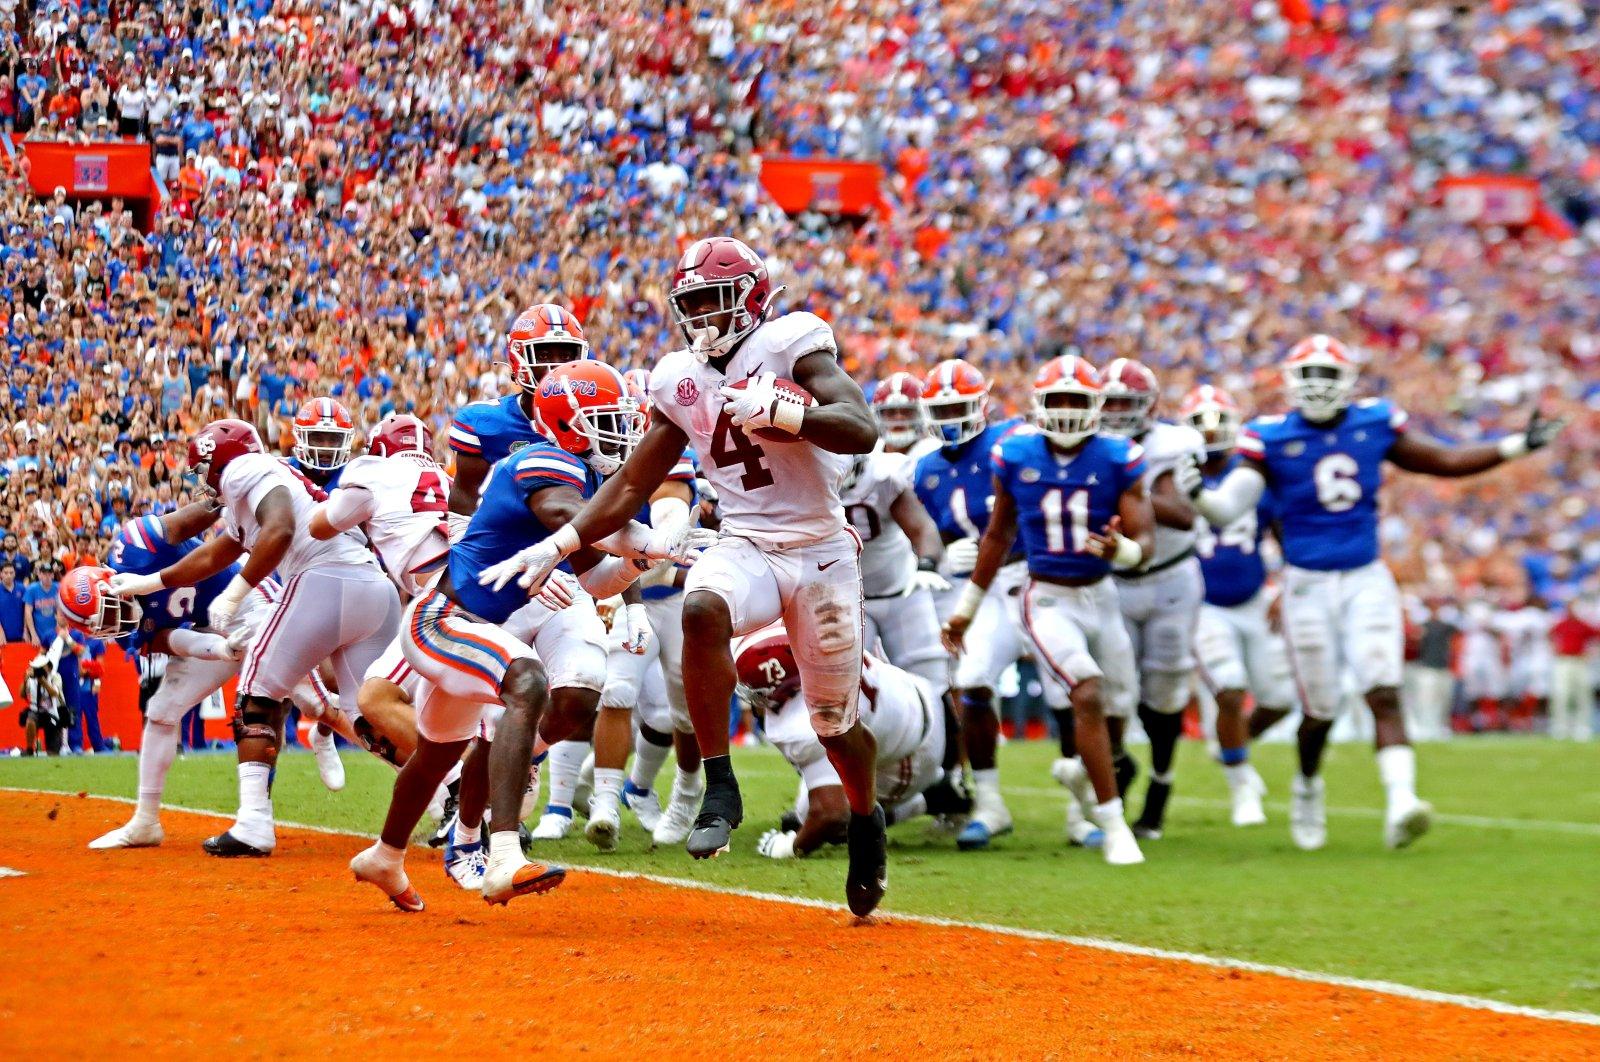 Alabama Crimson Tide running back Brian Robinson Jr. (4) scores a touchdown during the third quarter against the Florida Gators at Ben Hill Griffin Stadium, Gainesville, Florida, U.S., Sept. 18, 2021. (Mark J. Rebilas-USA TODAY Sports via Reuters)